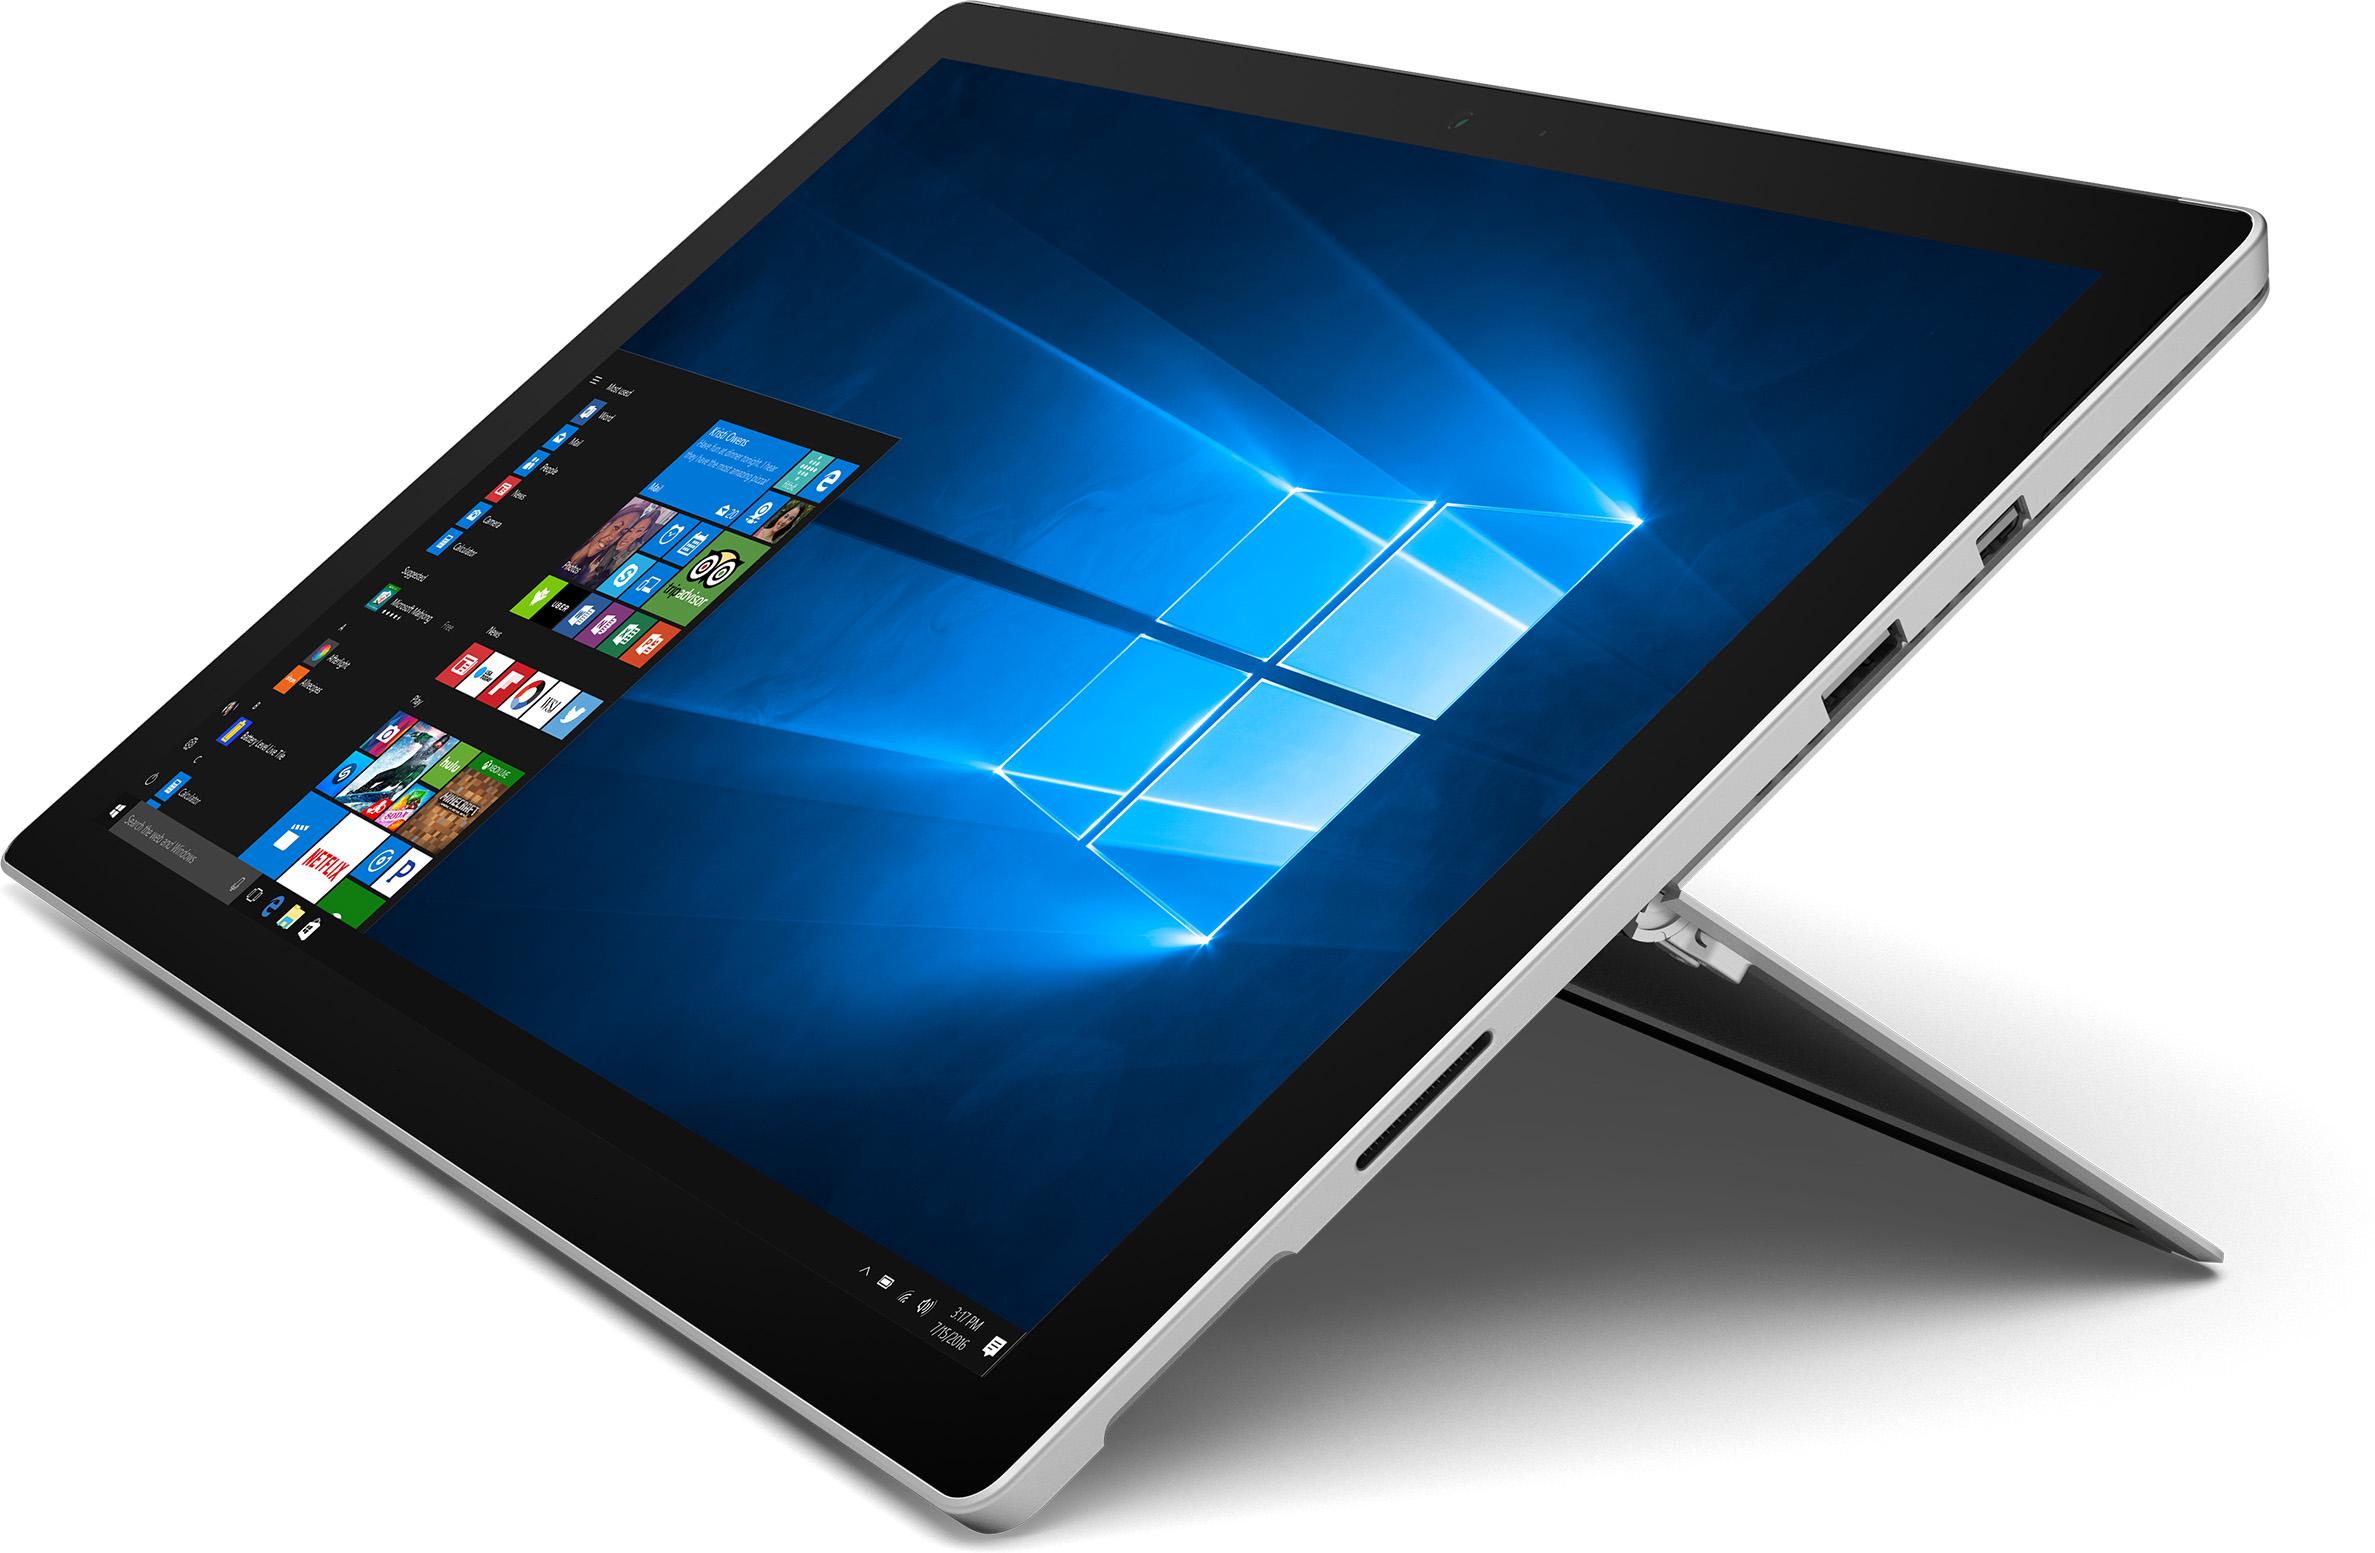 Bild Microsoft Surface Pro 4 â?? 128 GB / Intel Core m3 (4GB RAM)